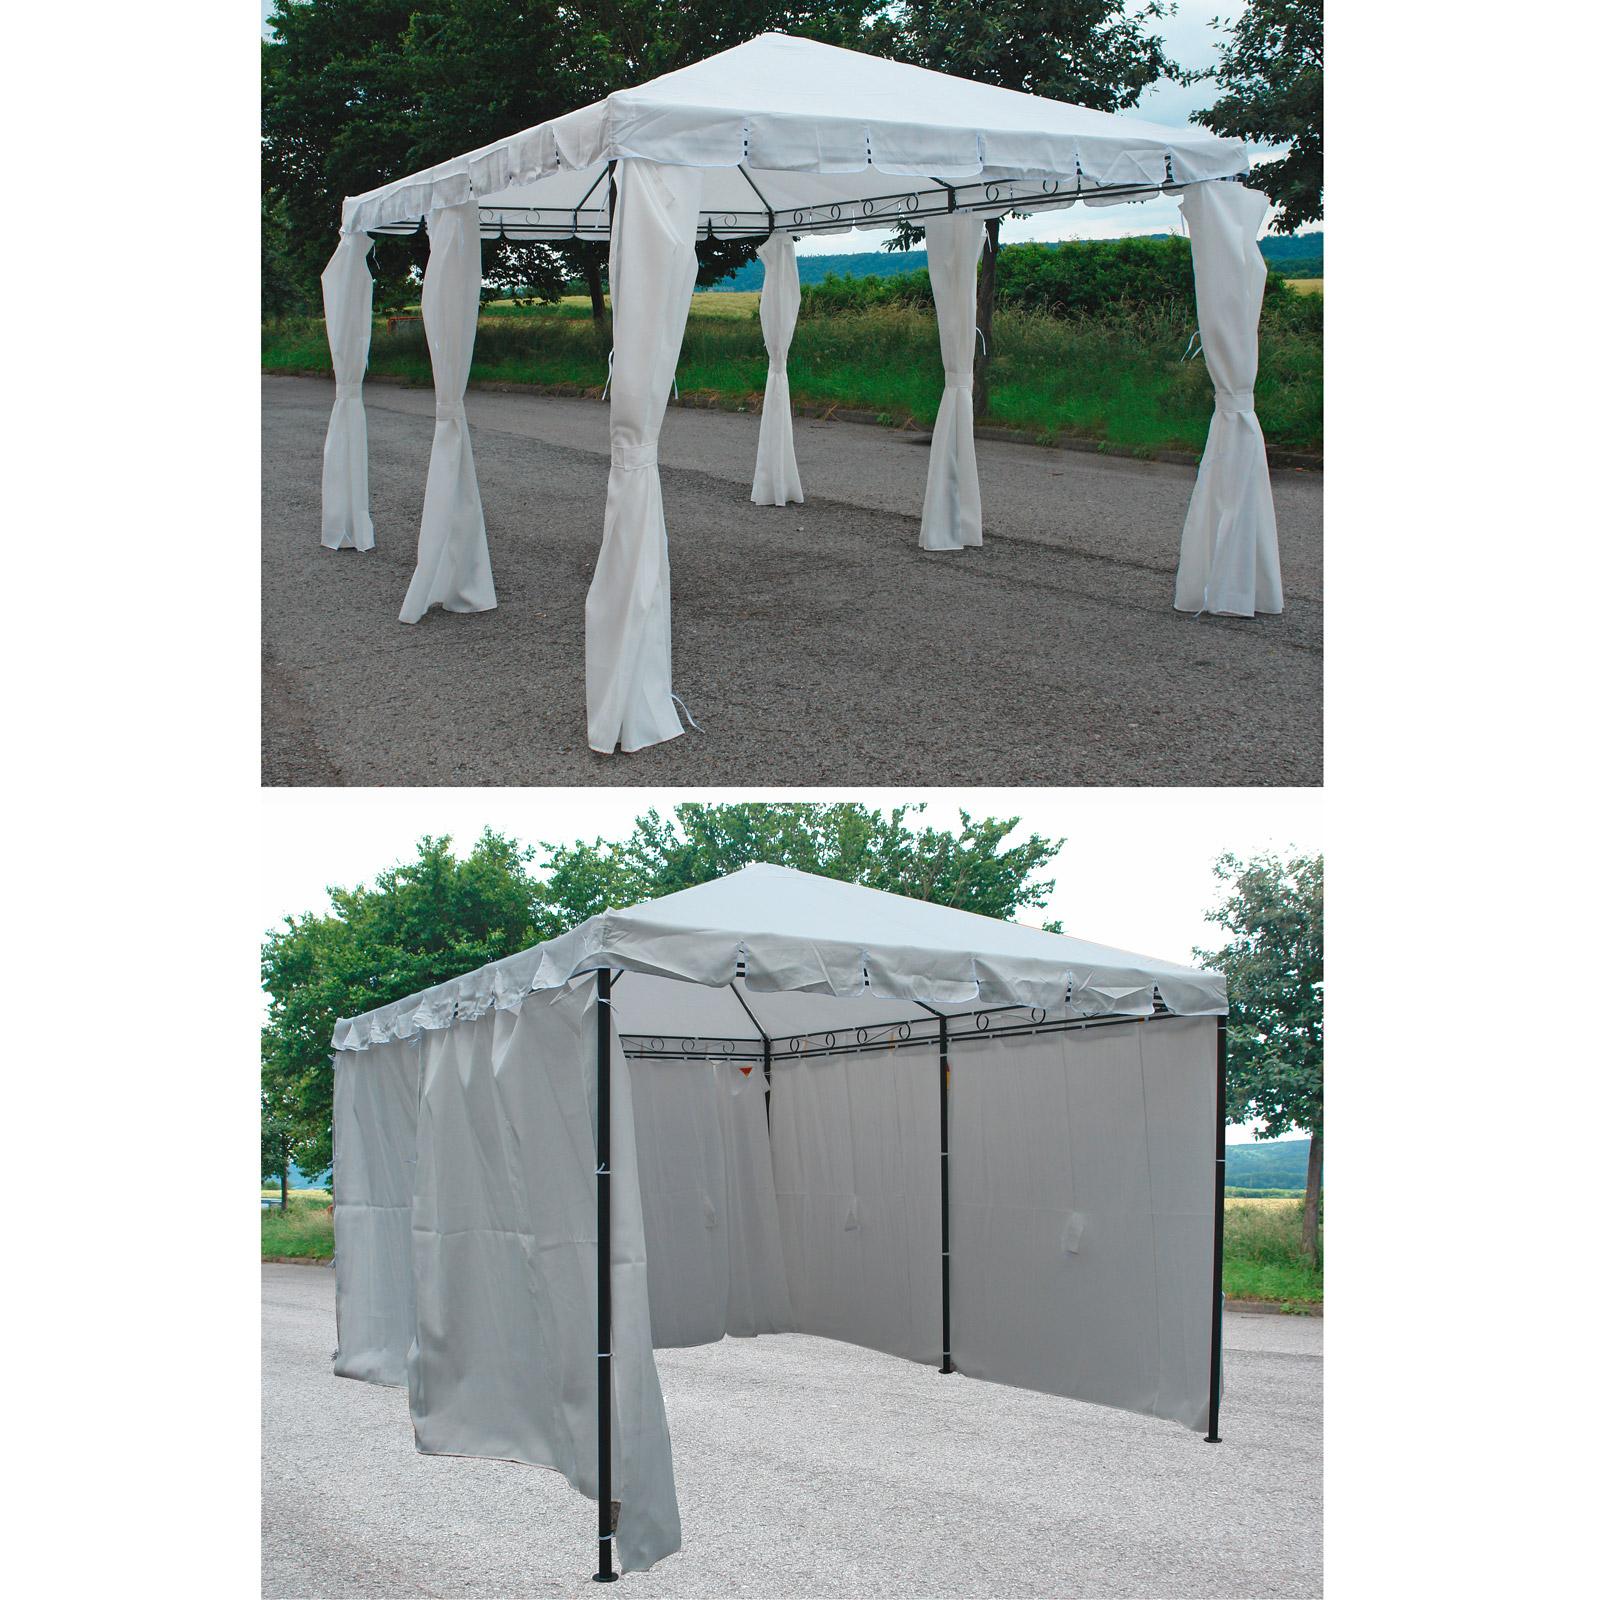 pavillon m metallgestell 3x4m walmdach 917490 14206 ebay. Black Bedroom Furniture Sets. Home Design Ideas